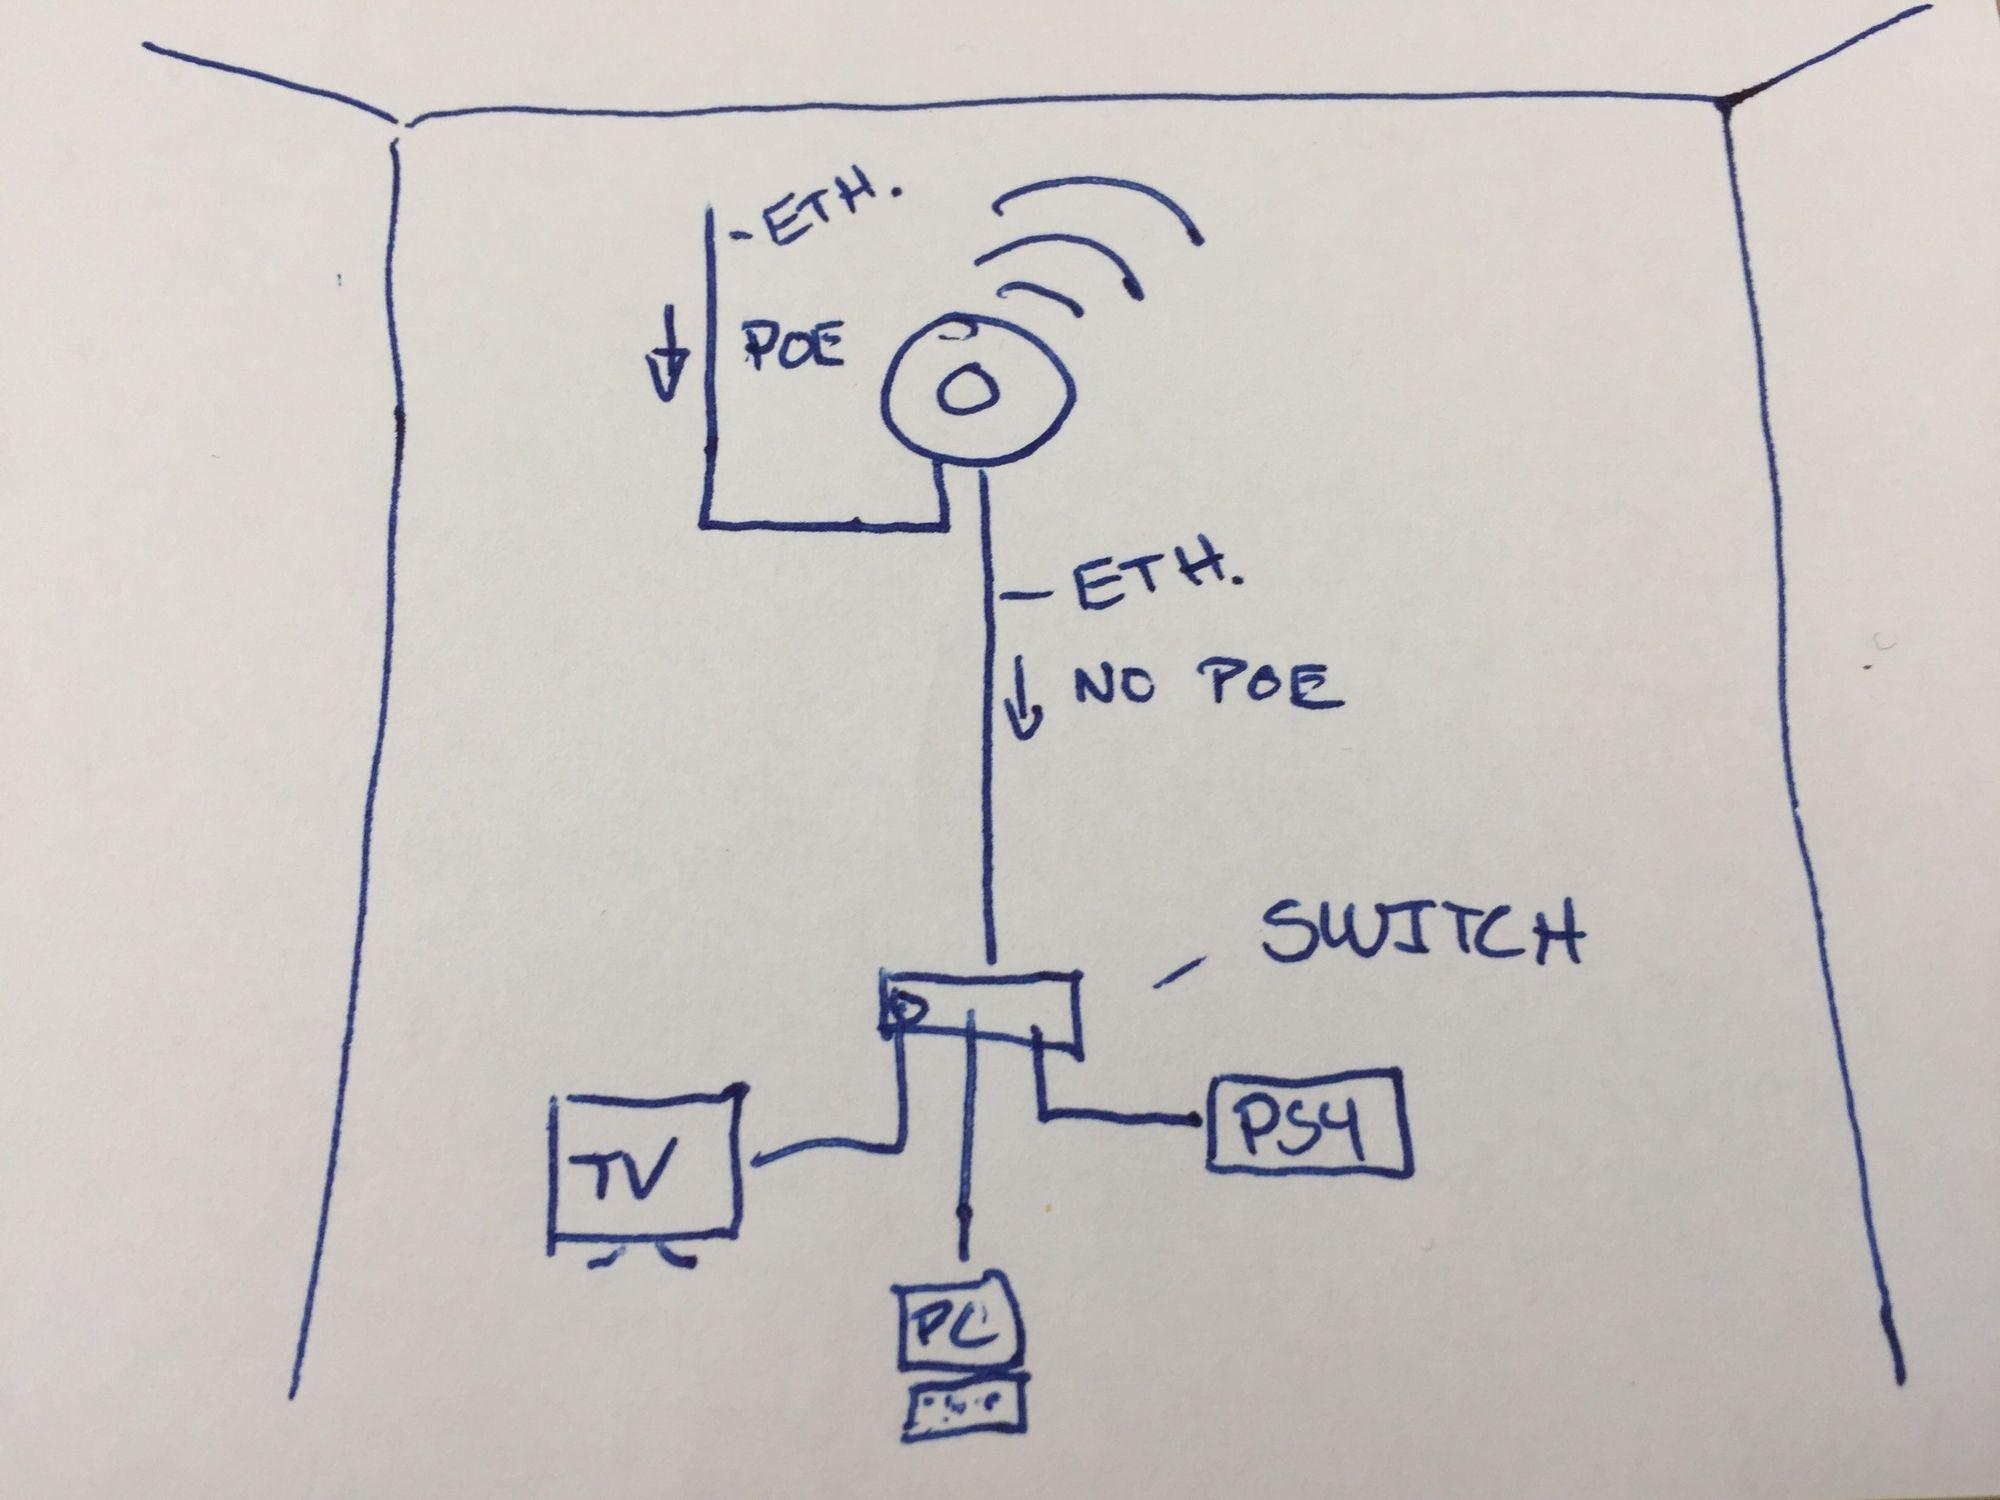 ubiquiti wiring diagram wired backhaul ubiquiti community  wired backhaul ubiquiti community